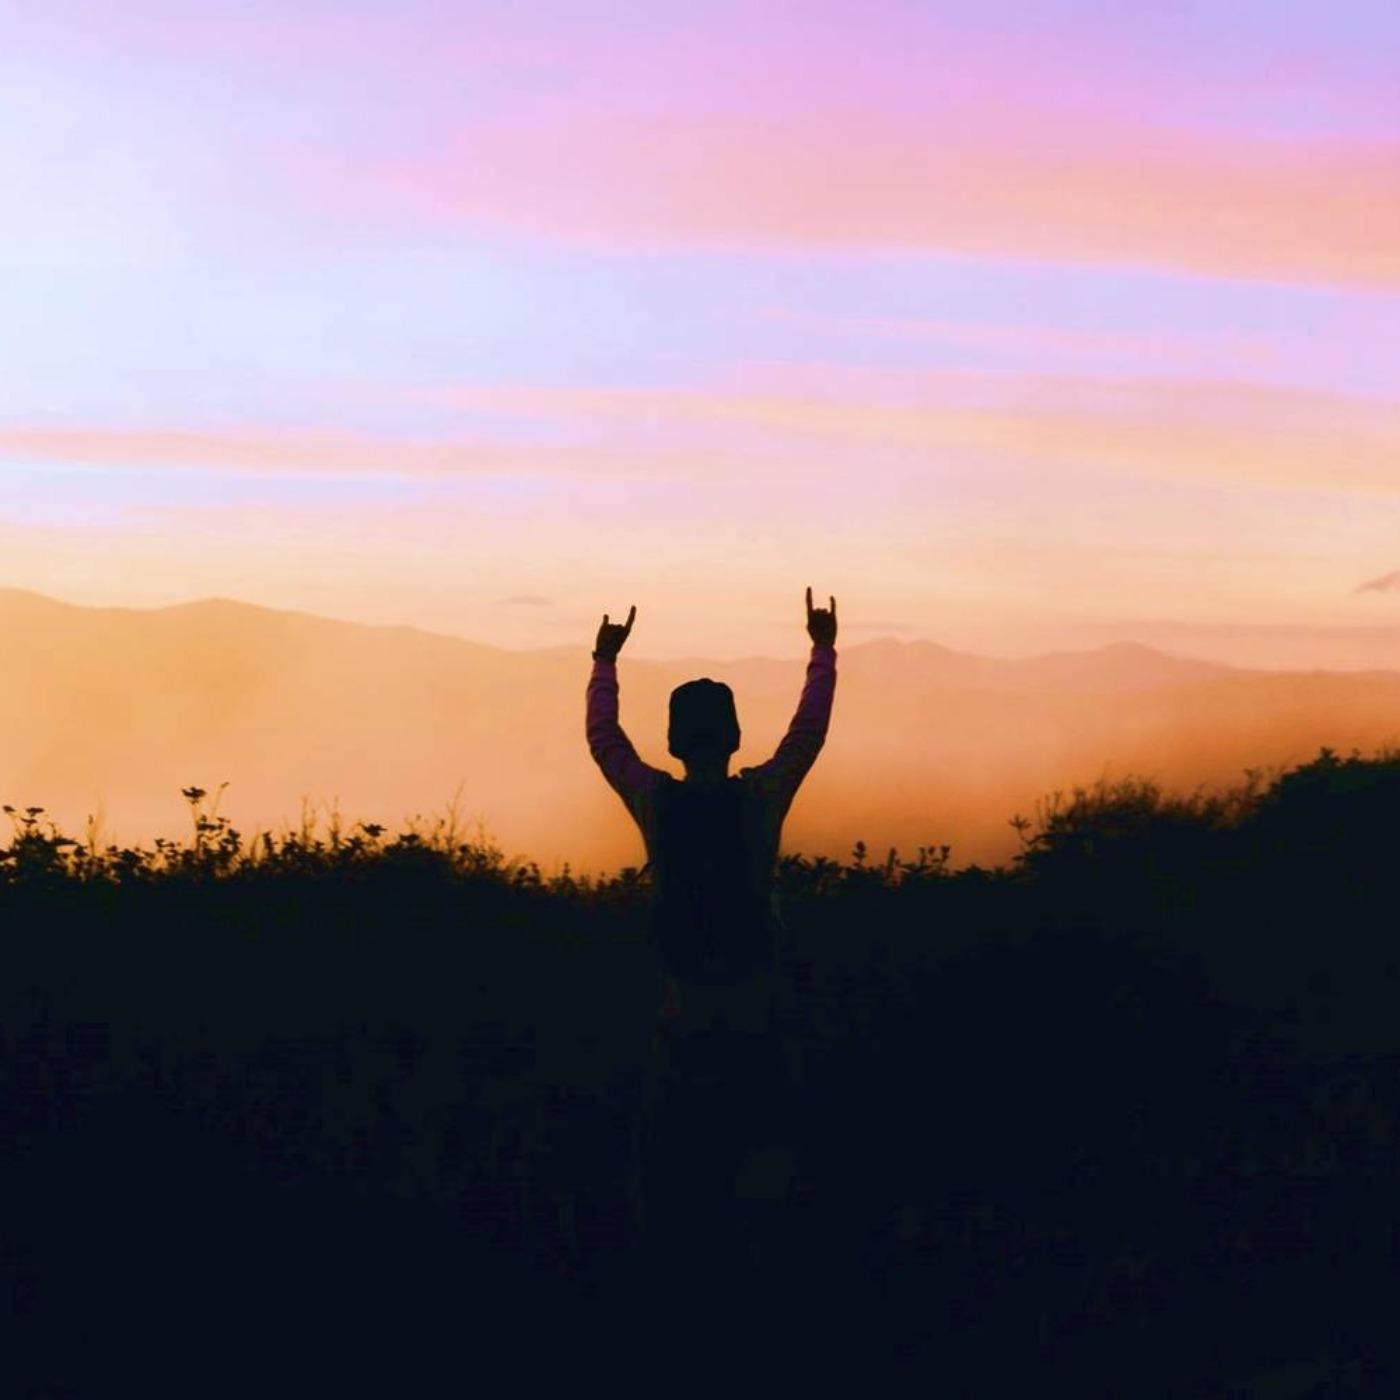 S7 Ep. 11: I Am Not a Victim: Overcoming Adversity